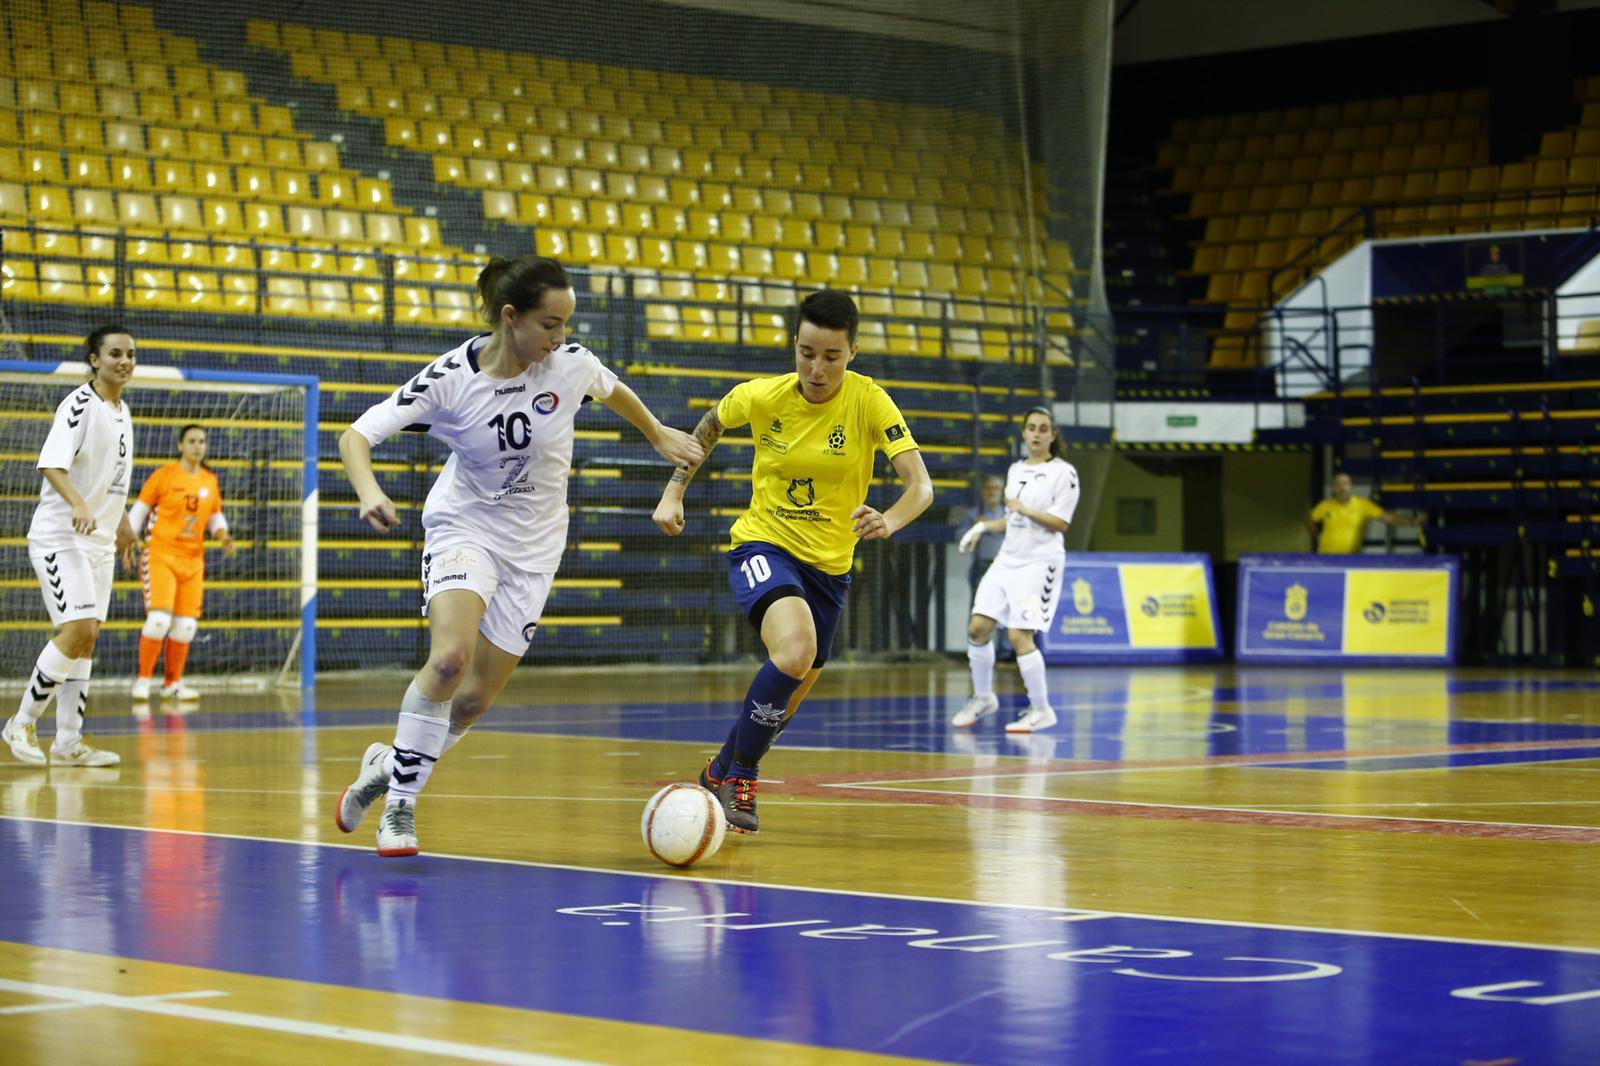 Crónica: Preconte Telde - Rivas FSF . Jornada 19ª. 2ª División Fútbol Sala Femenino. Grupo 4º